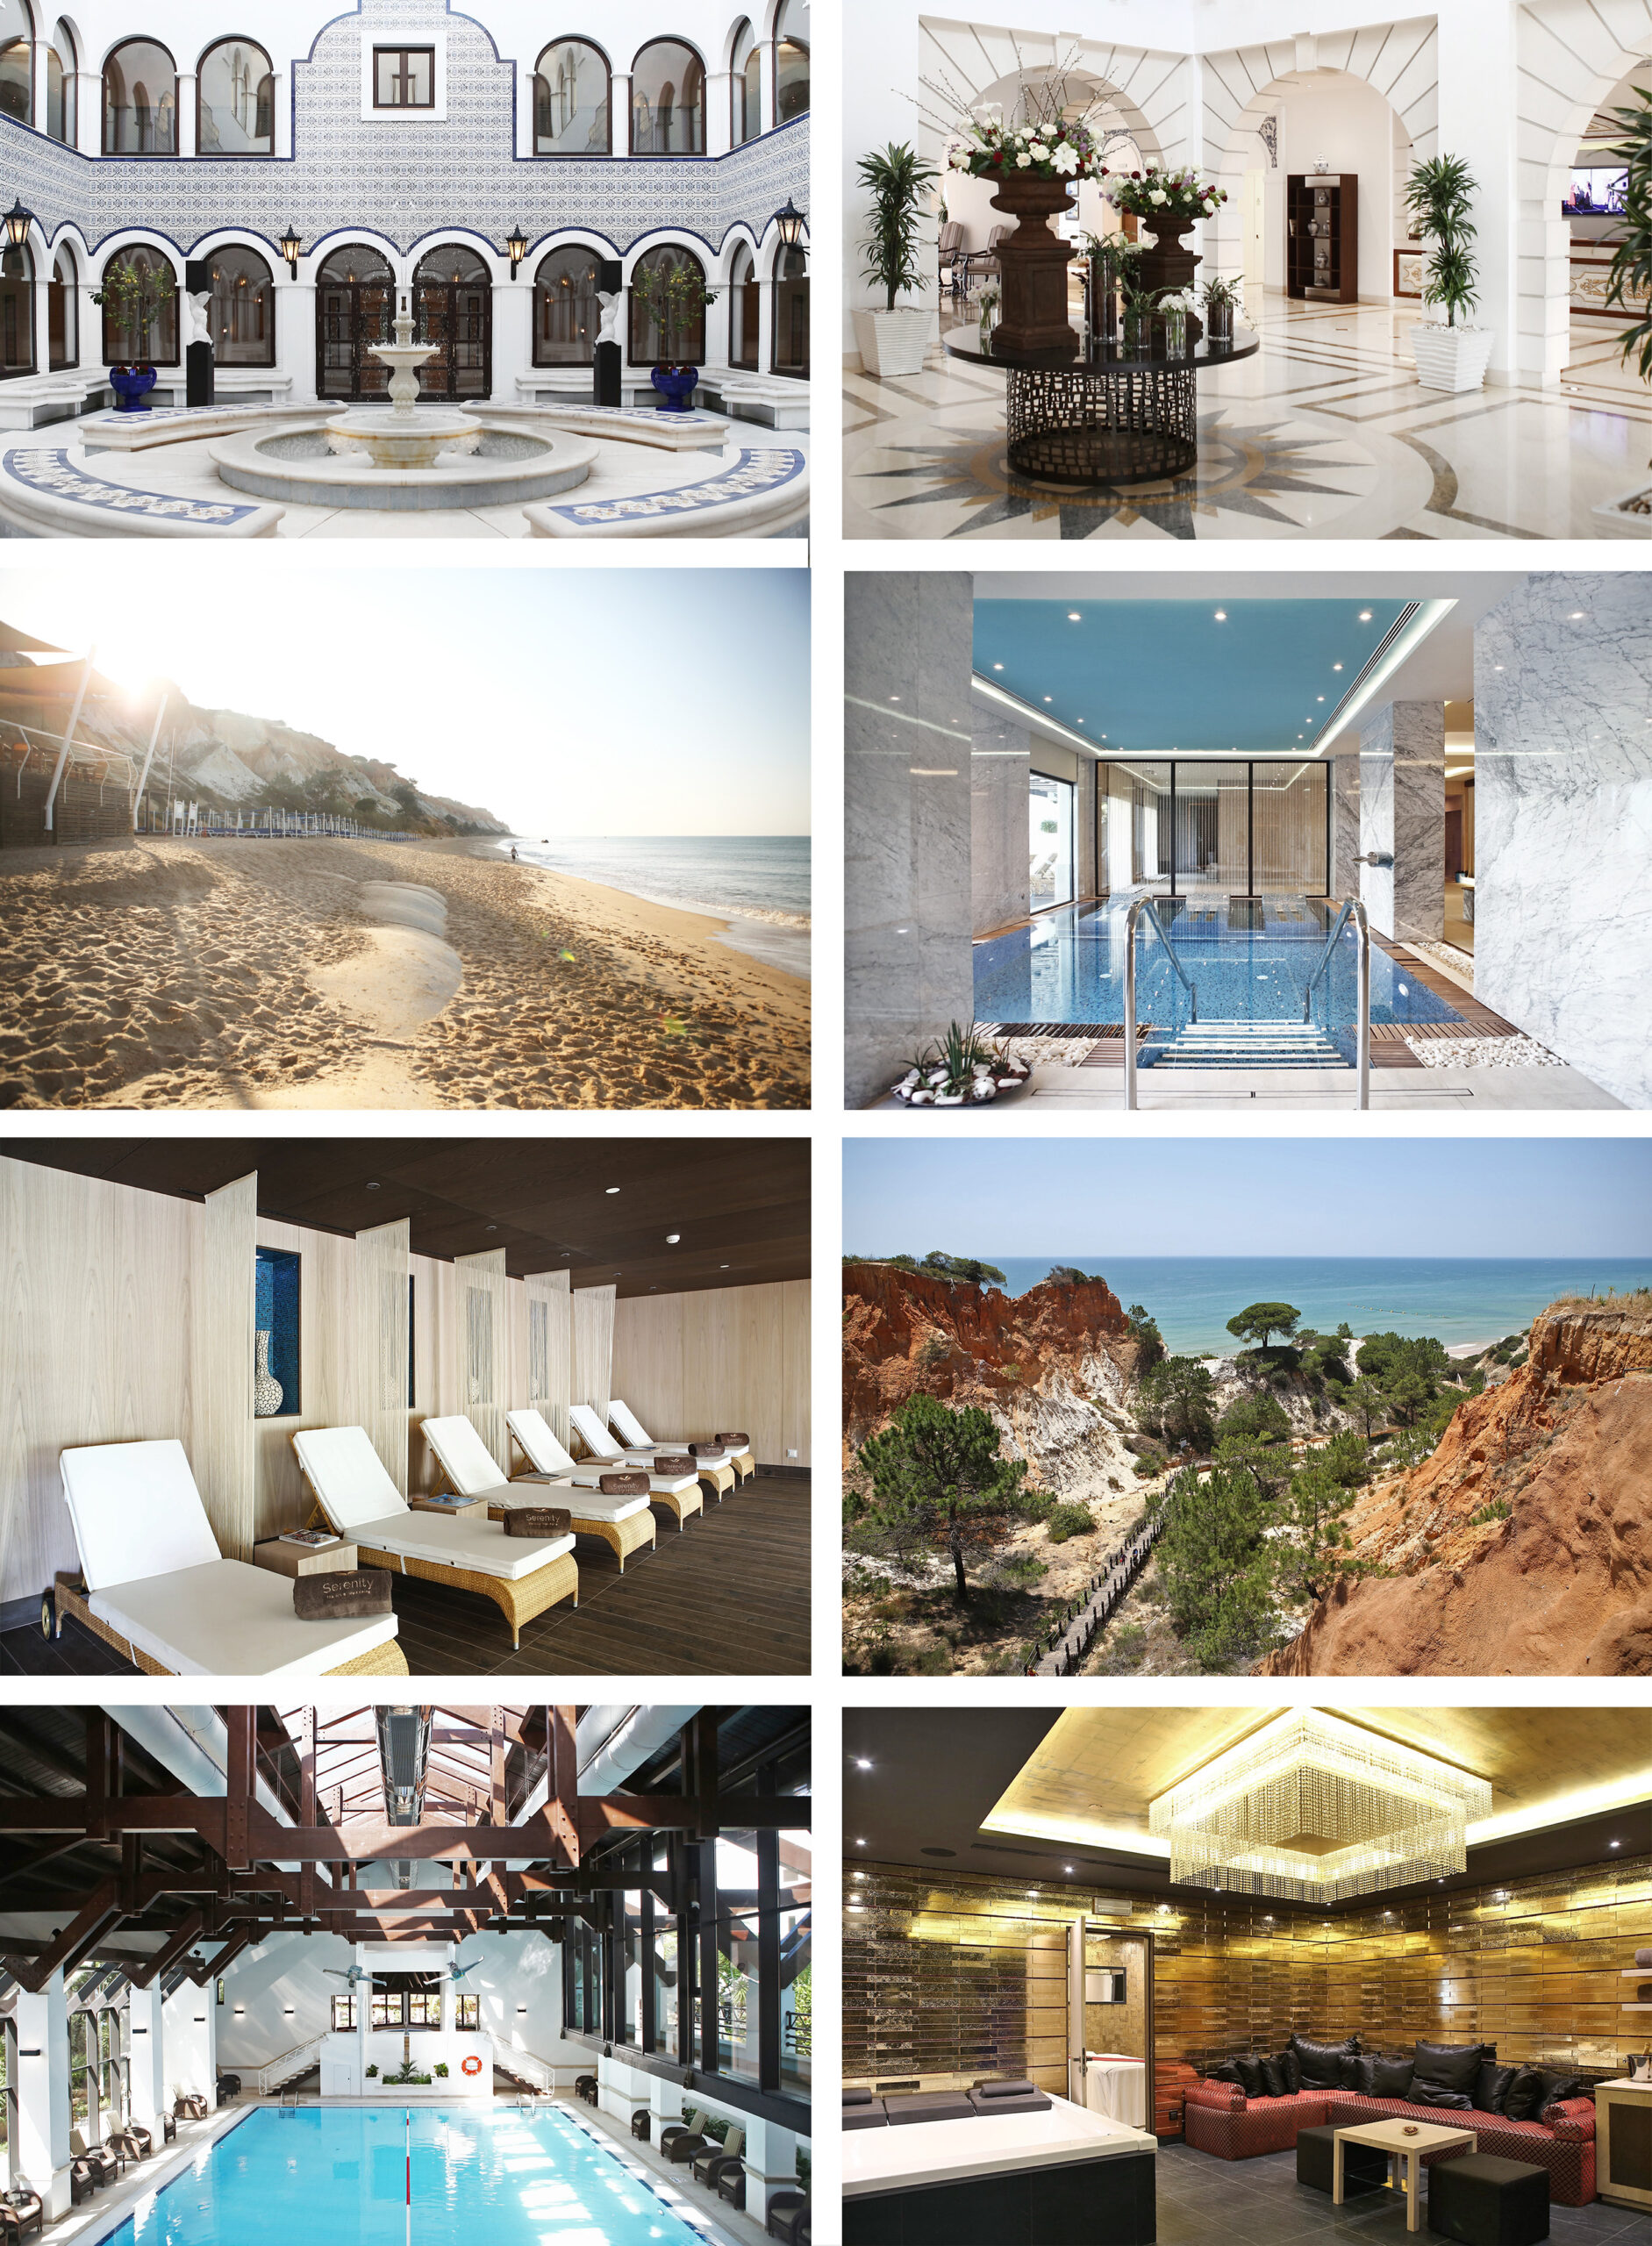 PINECLIFFS HOTEL RESPORT, PORTUGAL